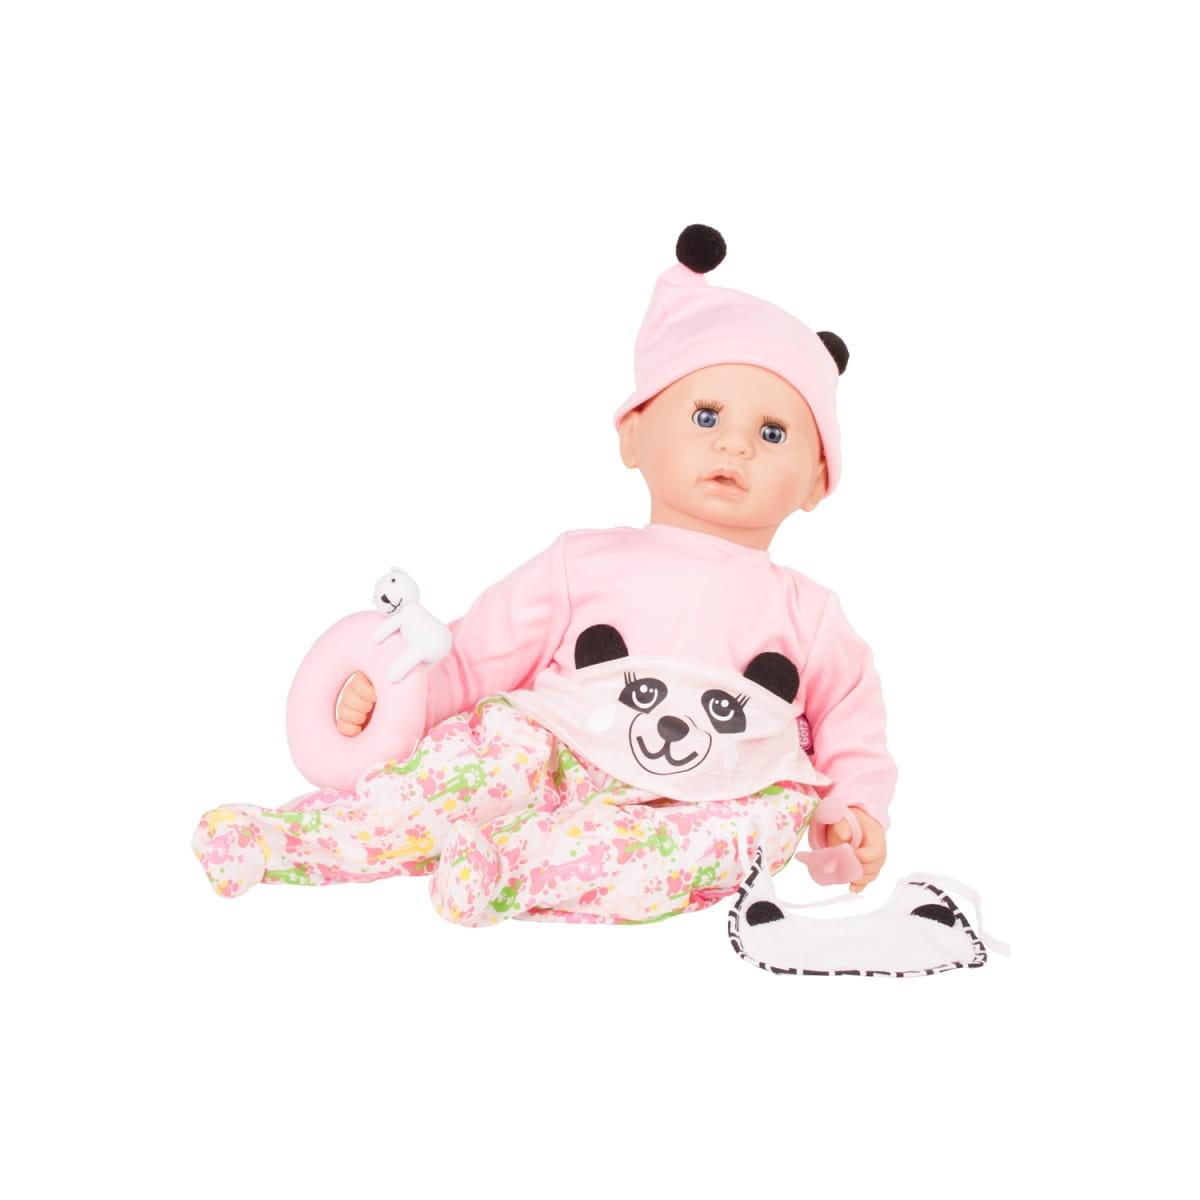 Кукла-пупс GOTZ Cookie Малыш - 48 см (в розовой кофточке и шапочке)